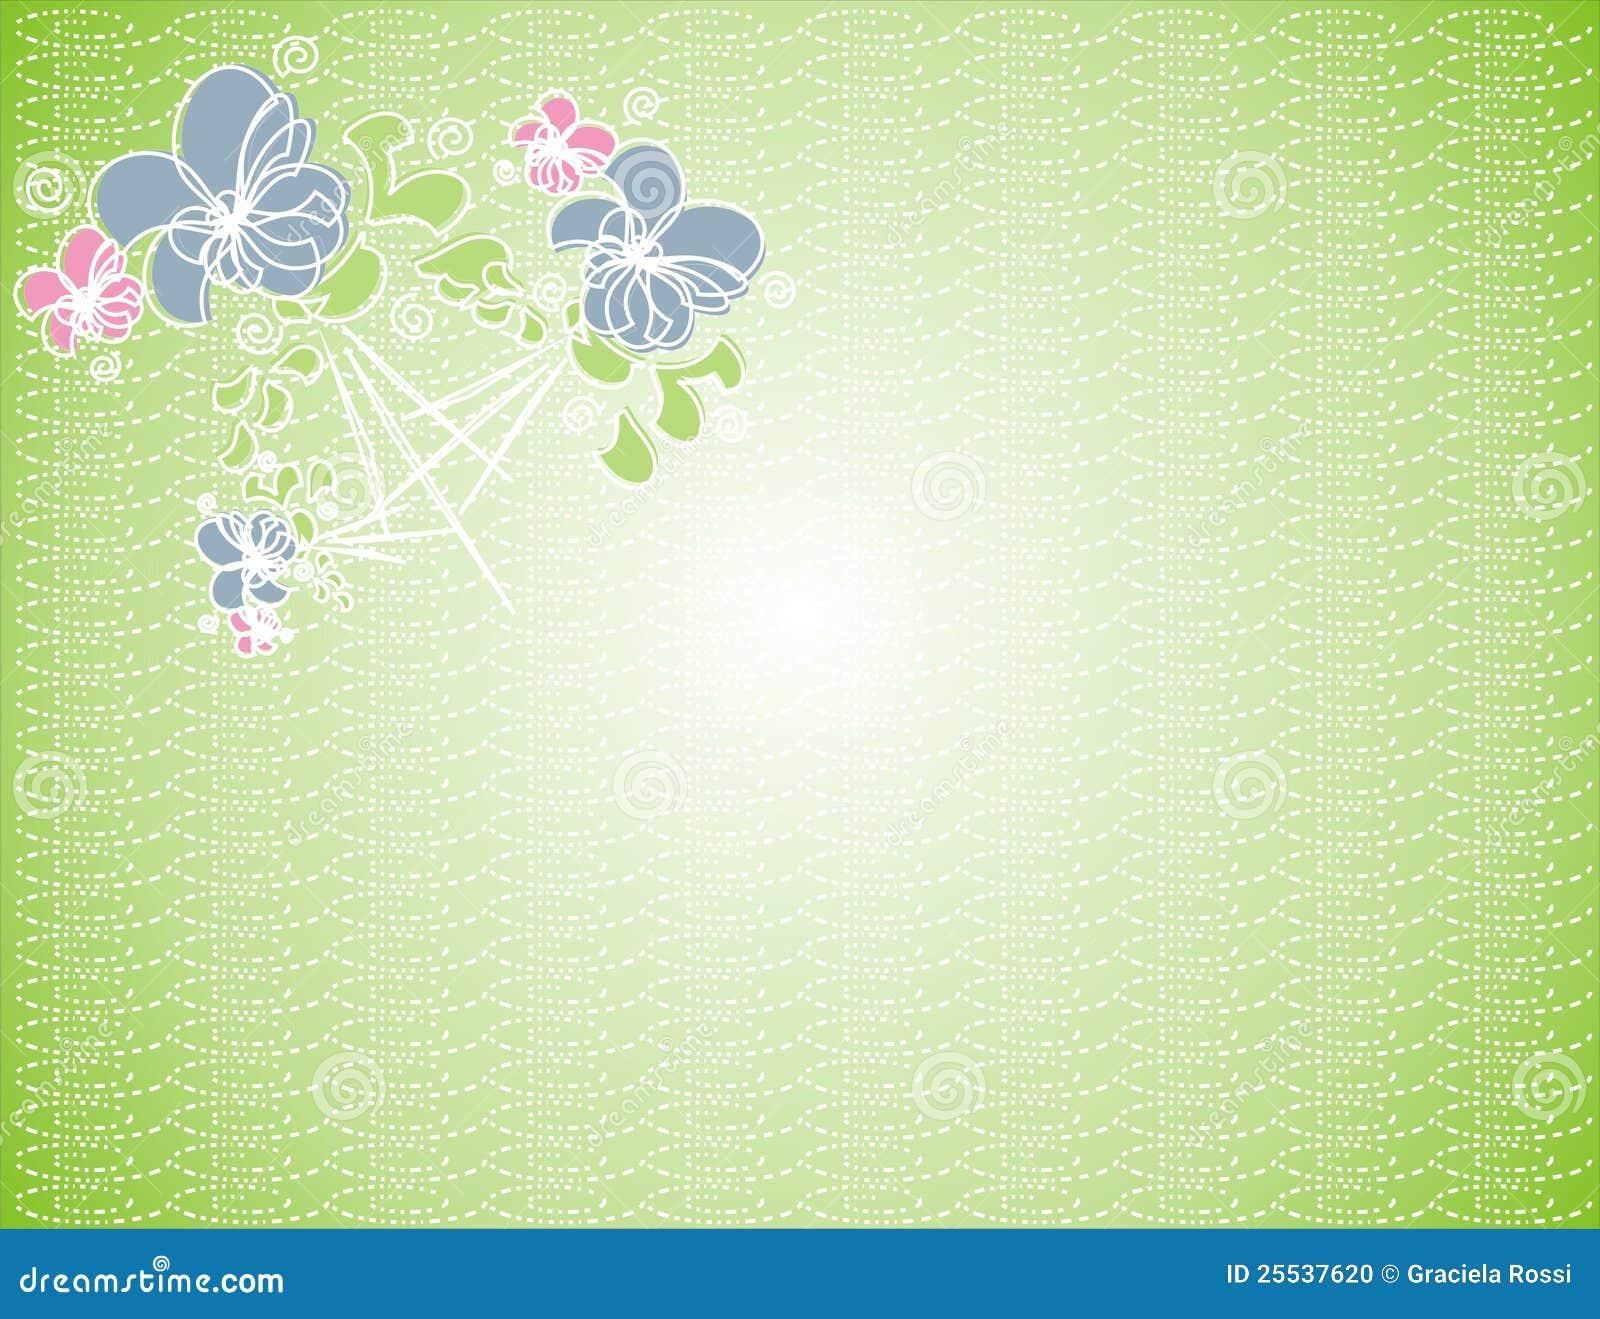 Fondosde Pantalla Flores: Feliz D A De Mayo Fondo Con